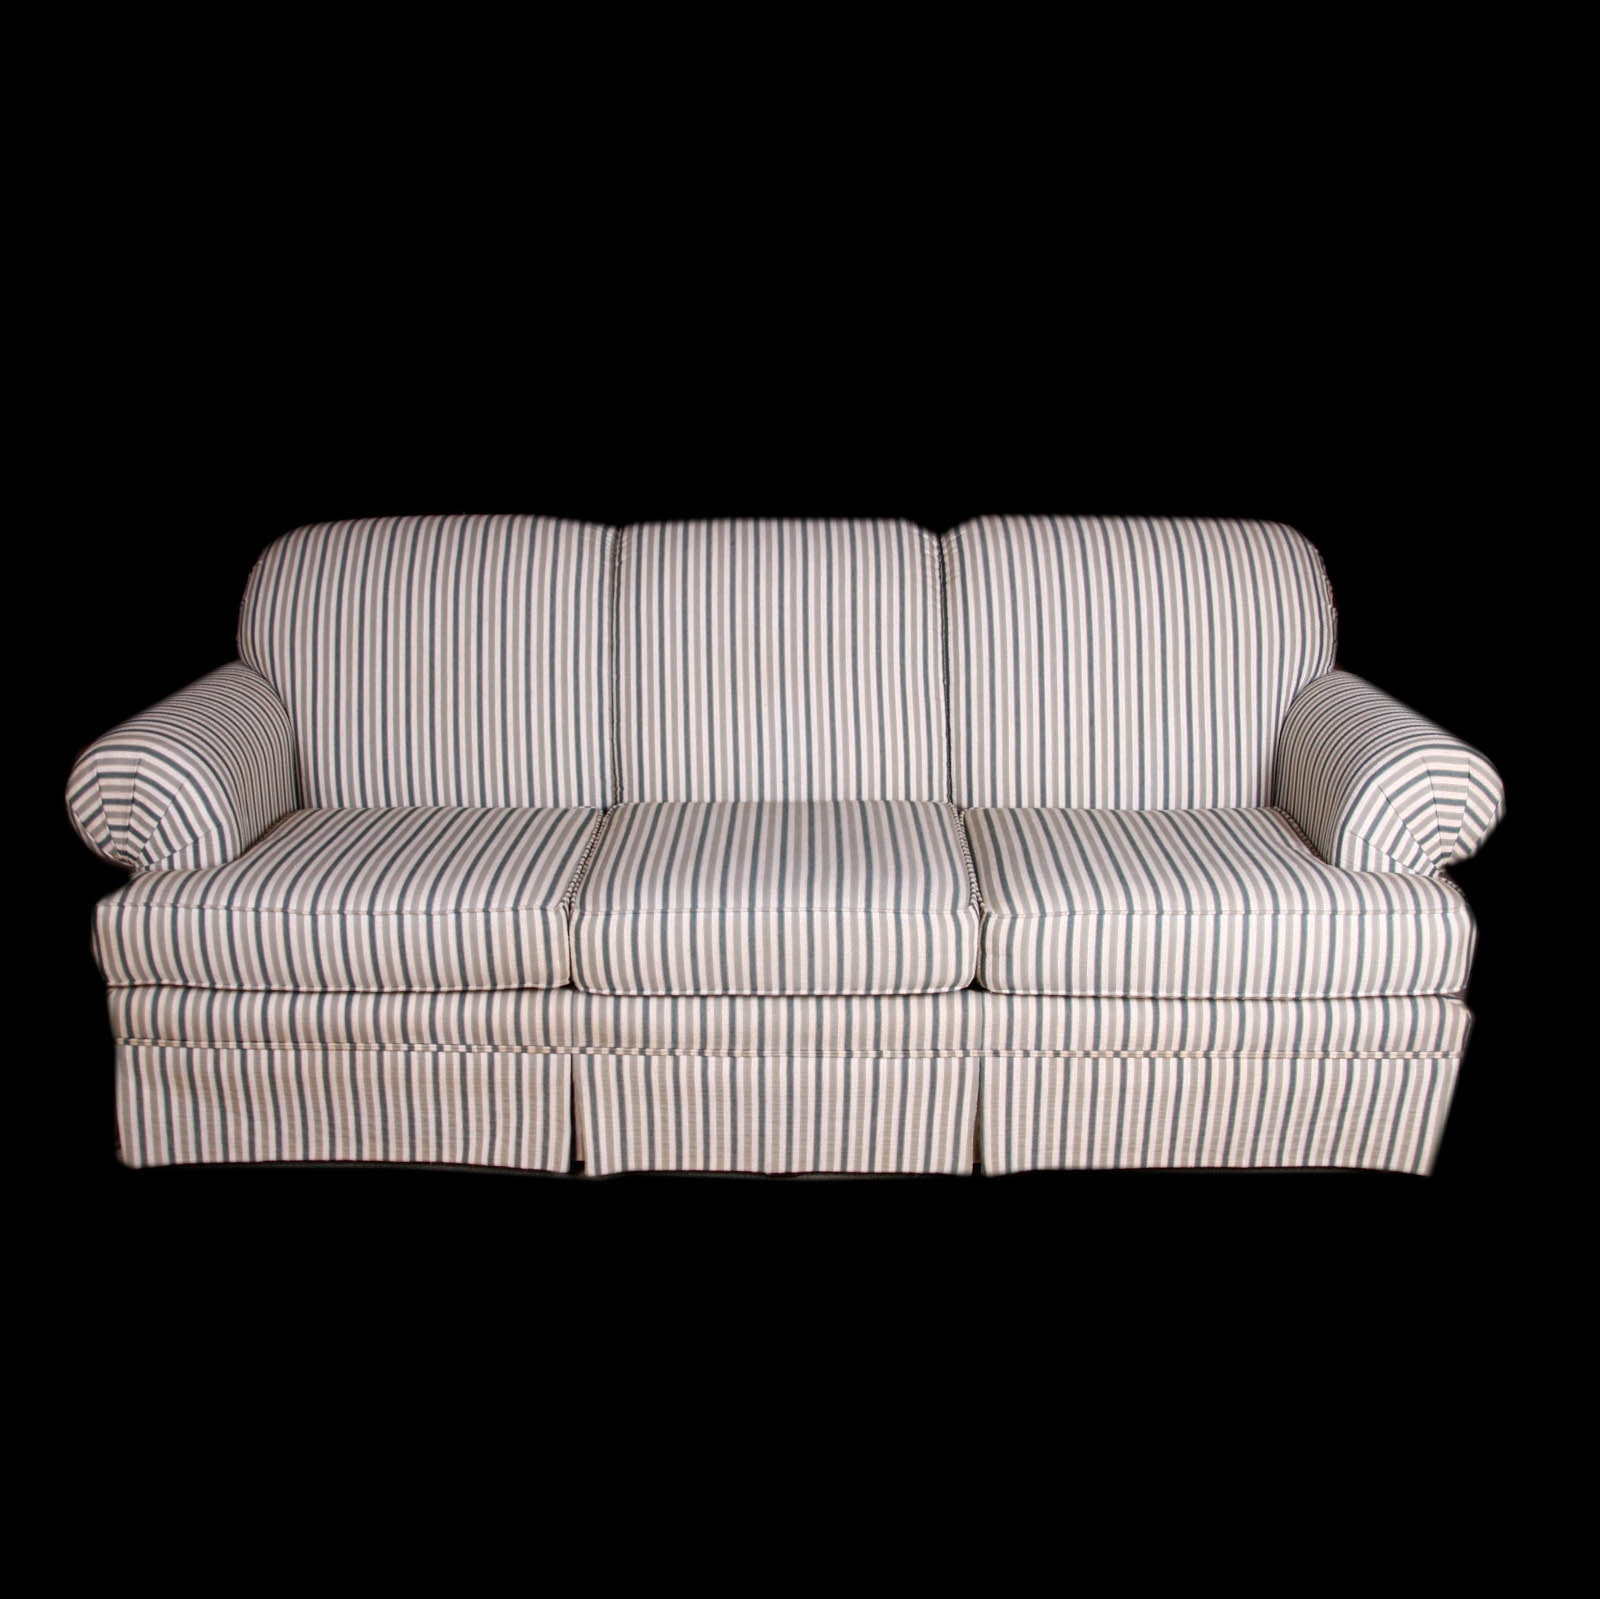 Broyhill Striped Sofa; 1x1 ...